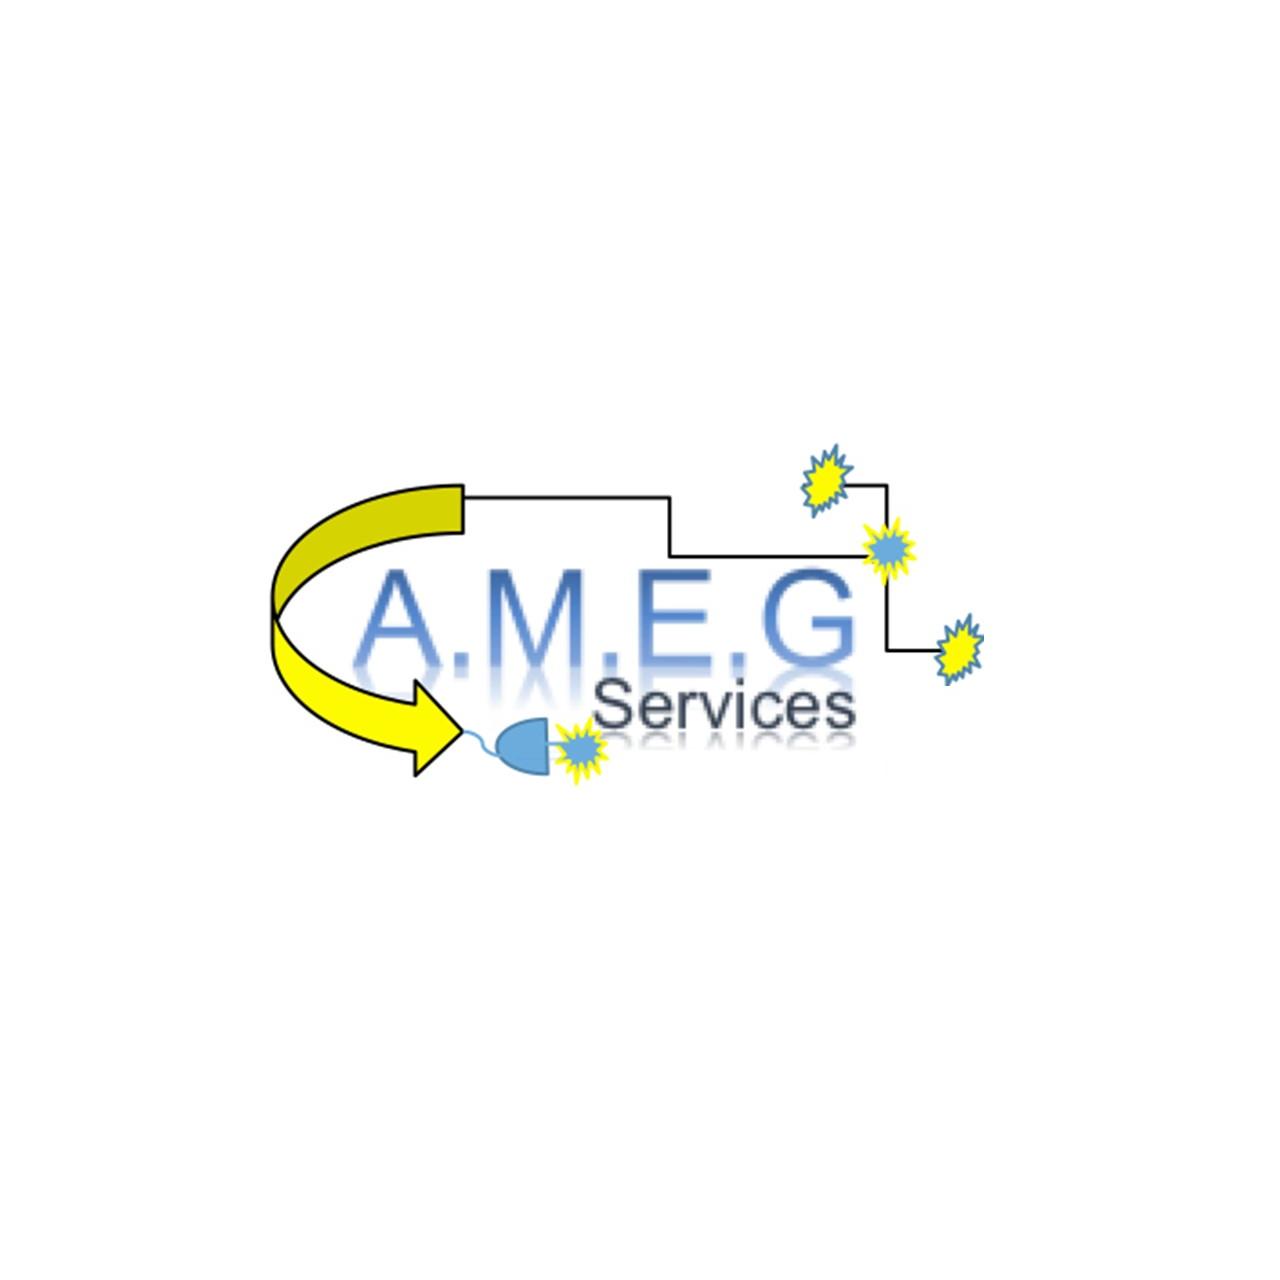 AMEG Services